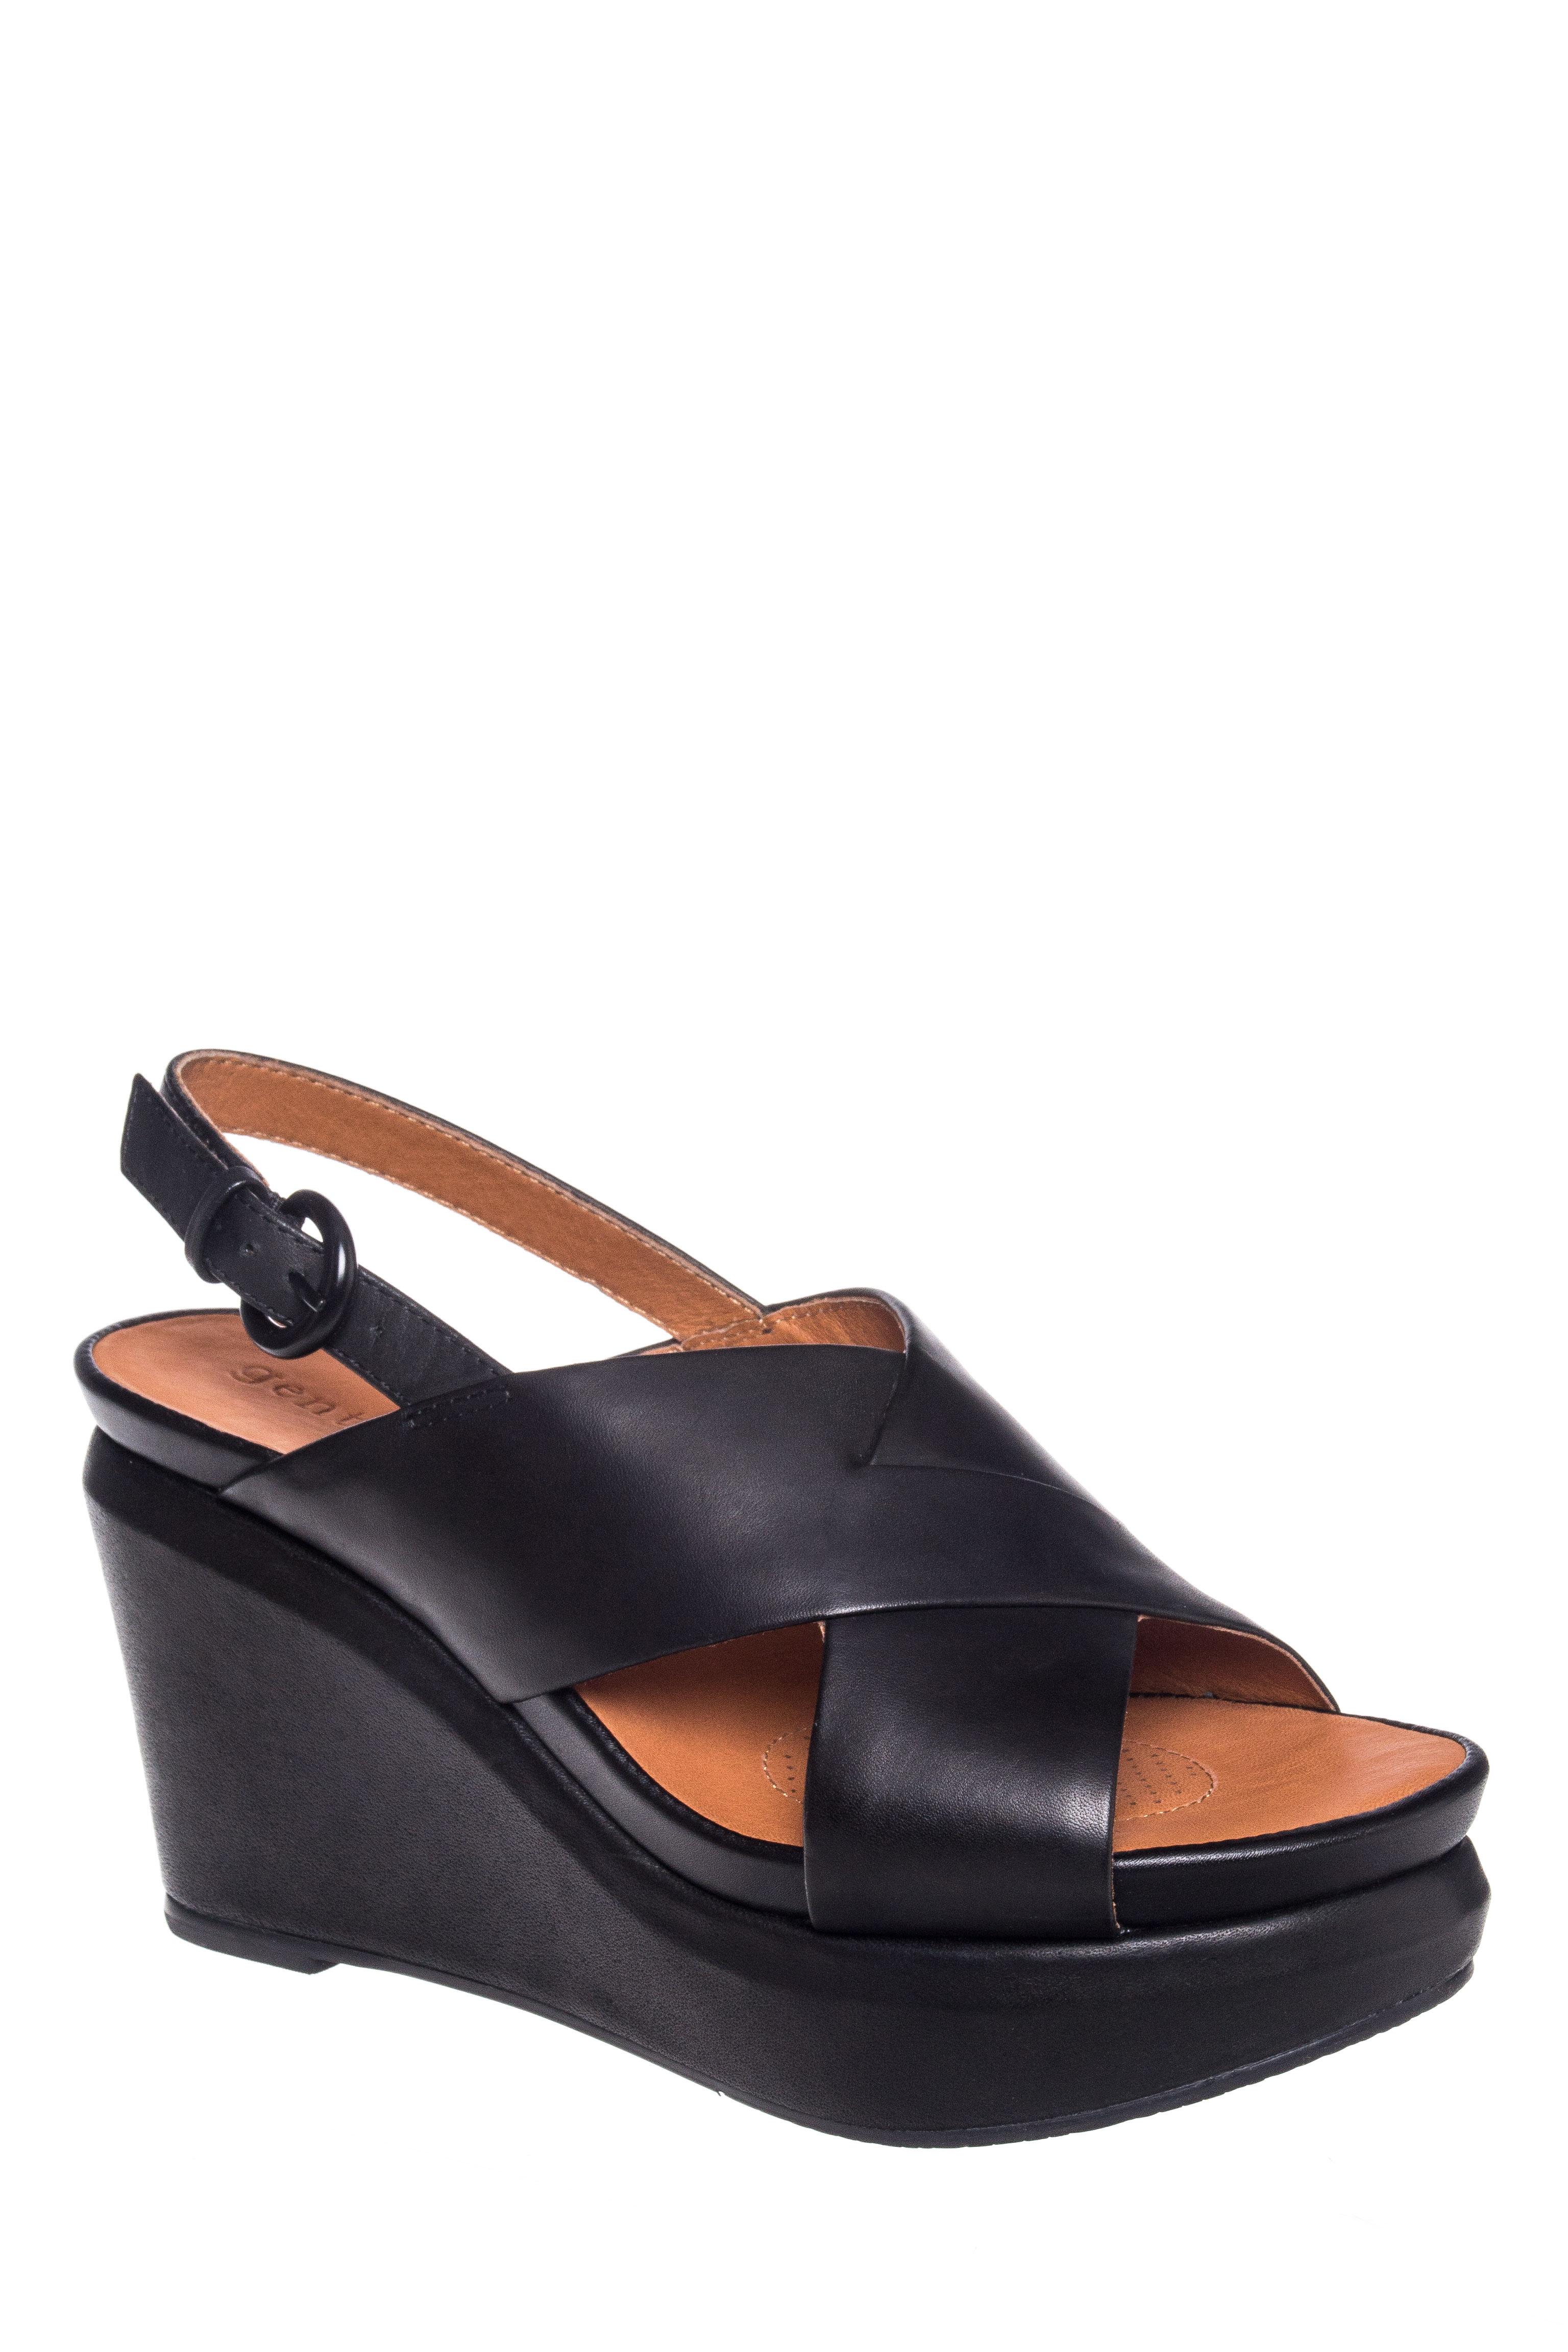 Jayne Platform Wedge Sandal